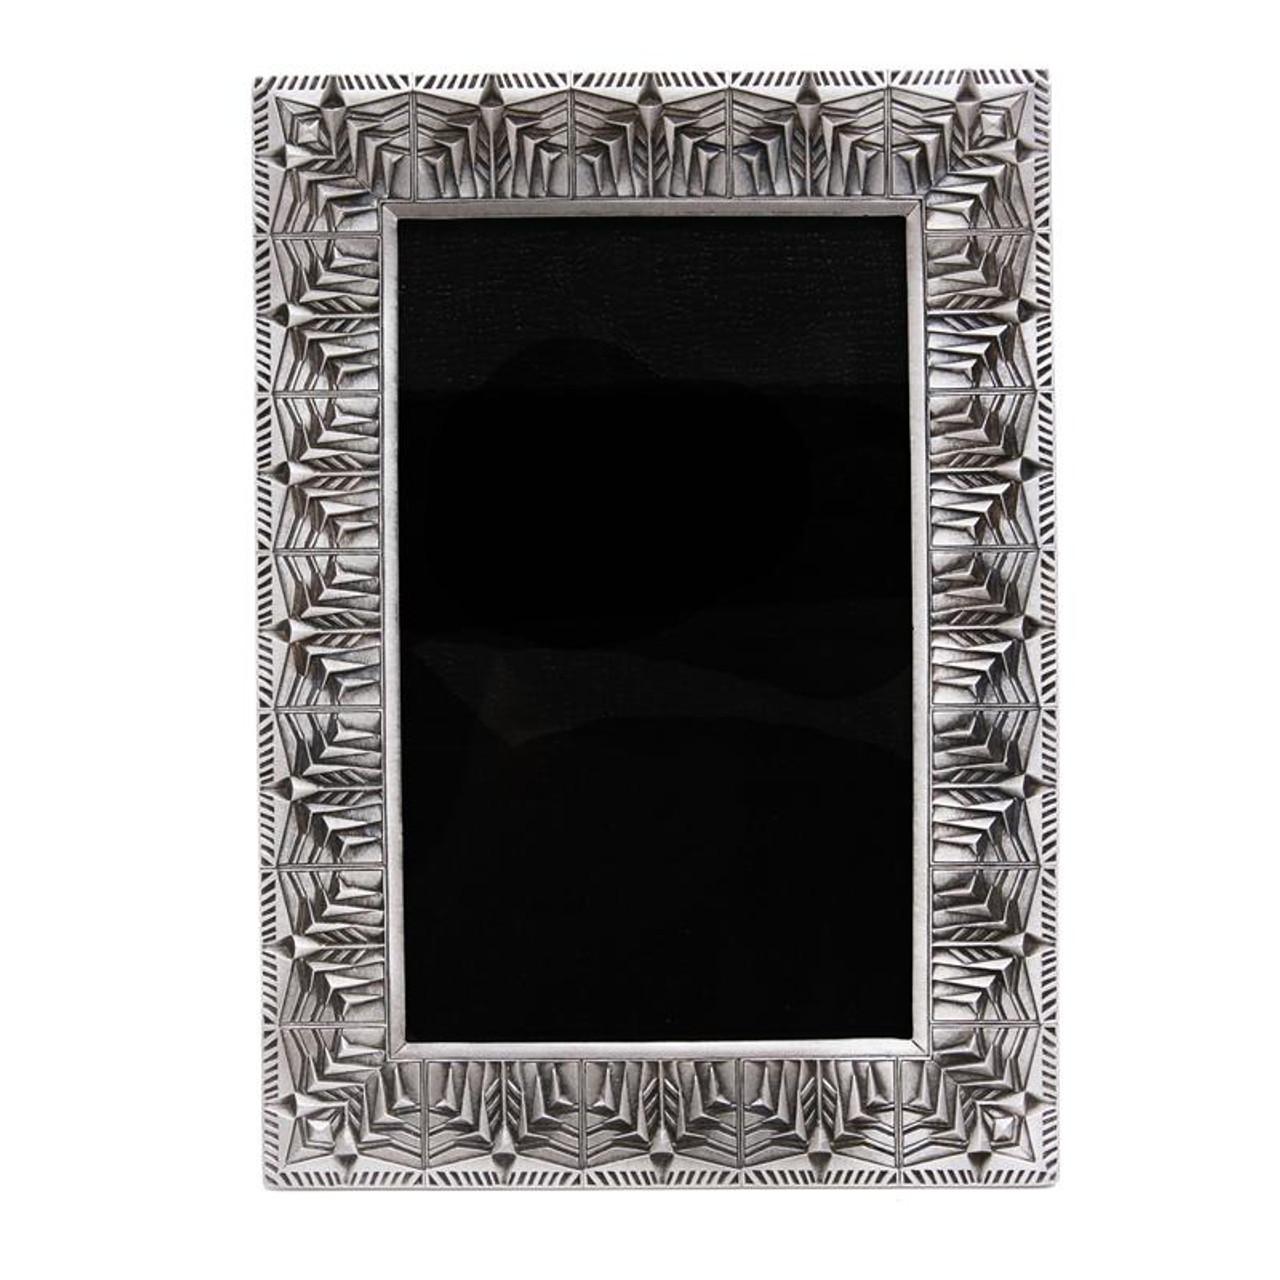 Biltmore Block Photo Frame - 5x7